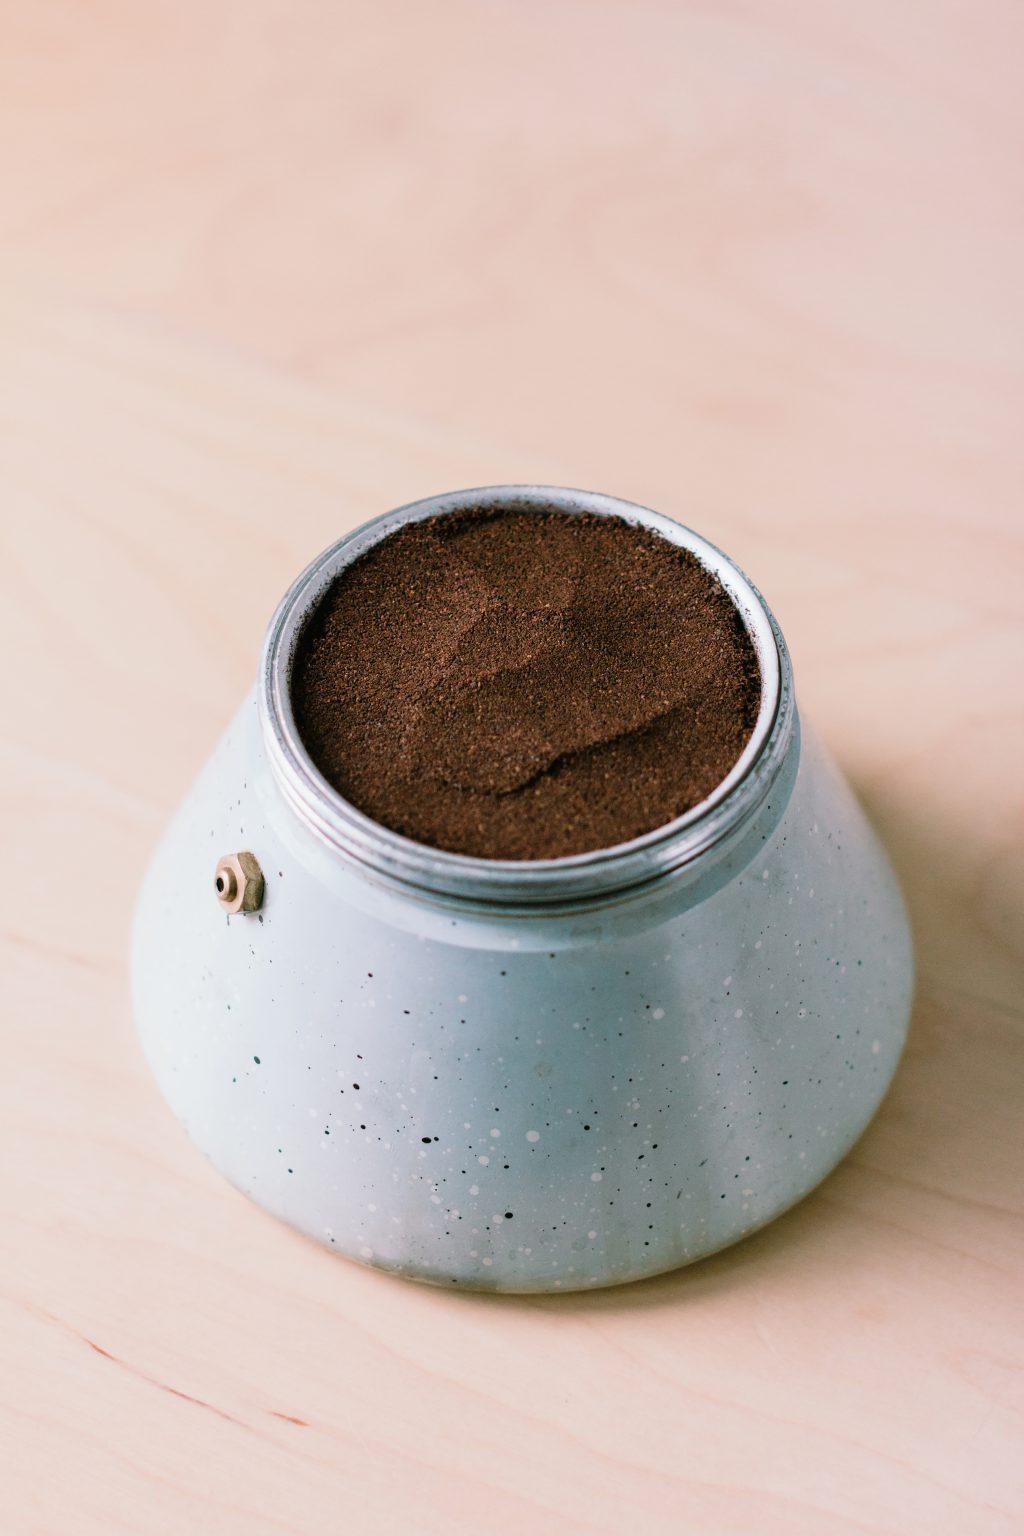 Ground coffee in a percolator - free stock photo